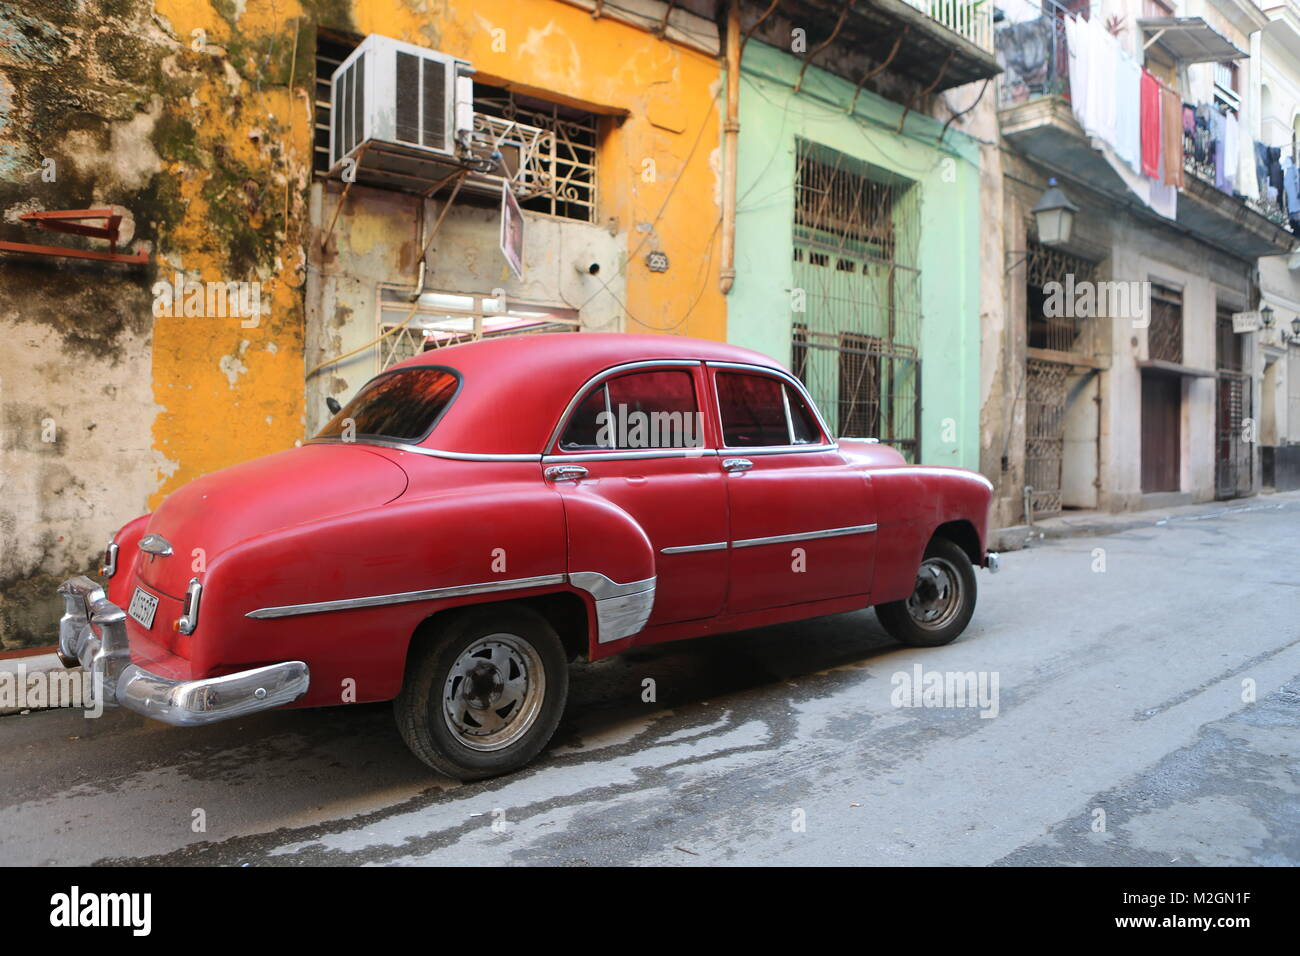 Cars in Street of La Habana - Cuba Stock Photo